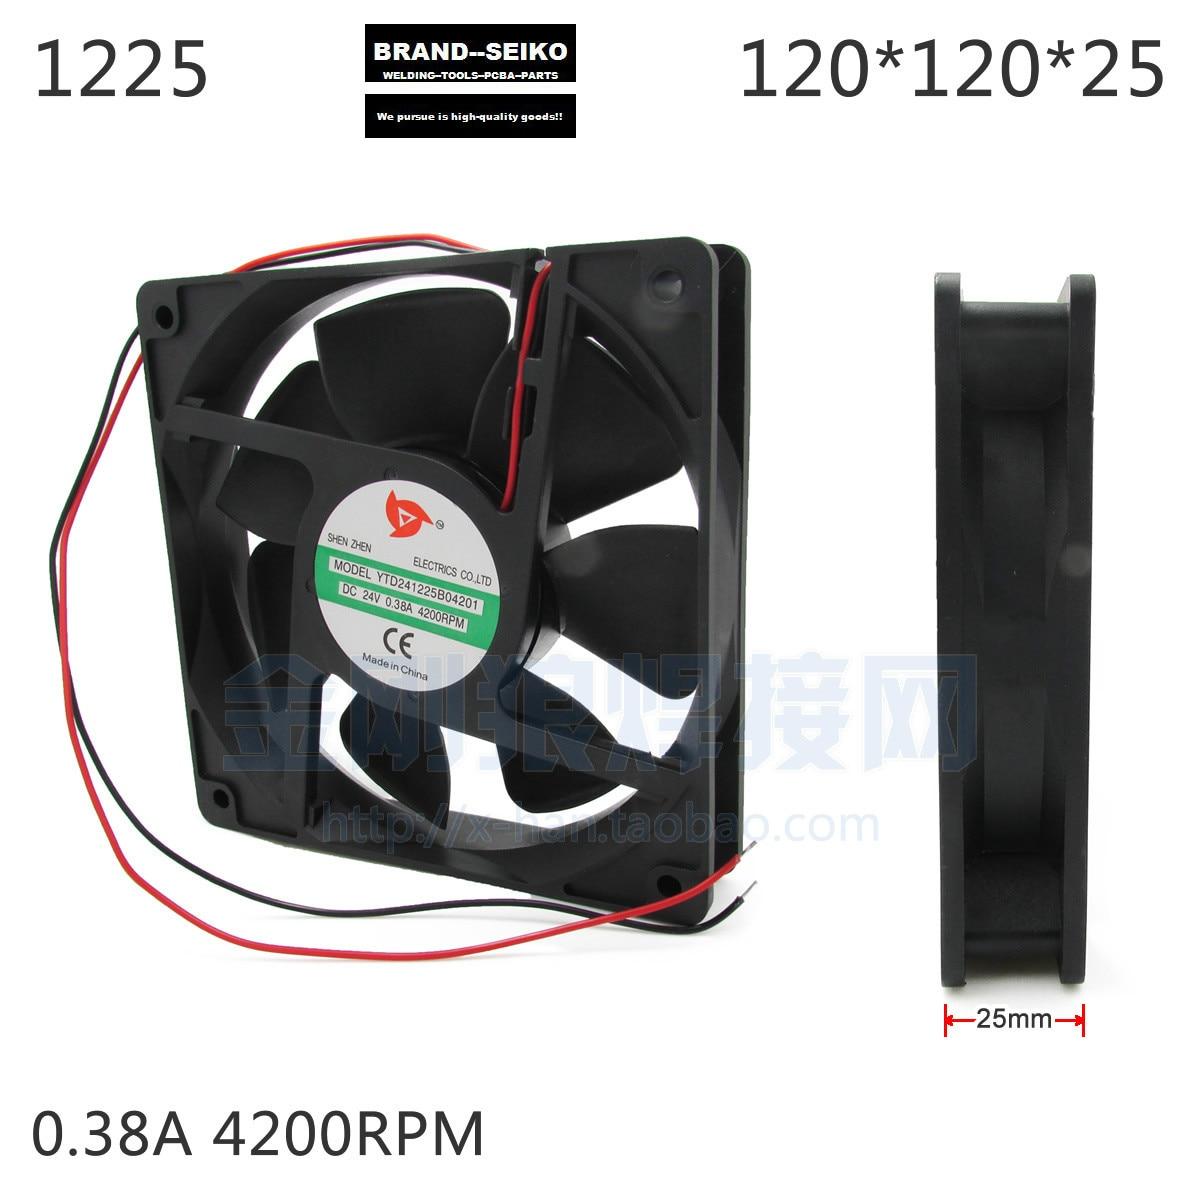 Inverter Welding Machine Thin Section High Speed Cooling Fan 1225 0.38a Dc24 4200 royal fan ut626dg tp 16cm220v 5w inverter cooling fan